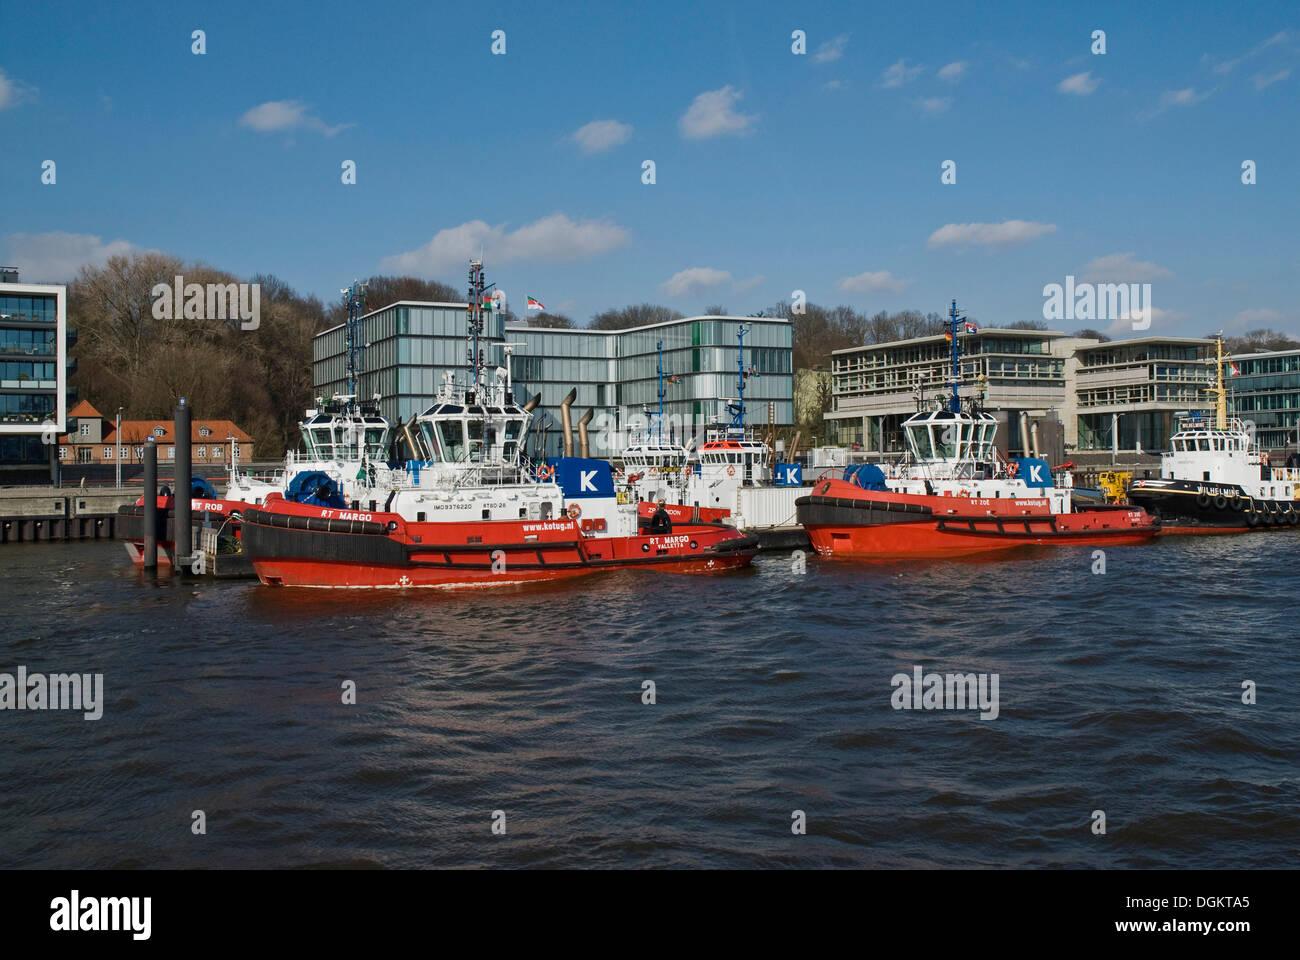 Harbour tugs in the Port of Hamburg, Elbe river, Hamburg - Stock Image